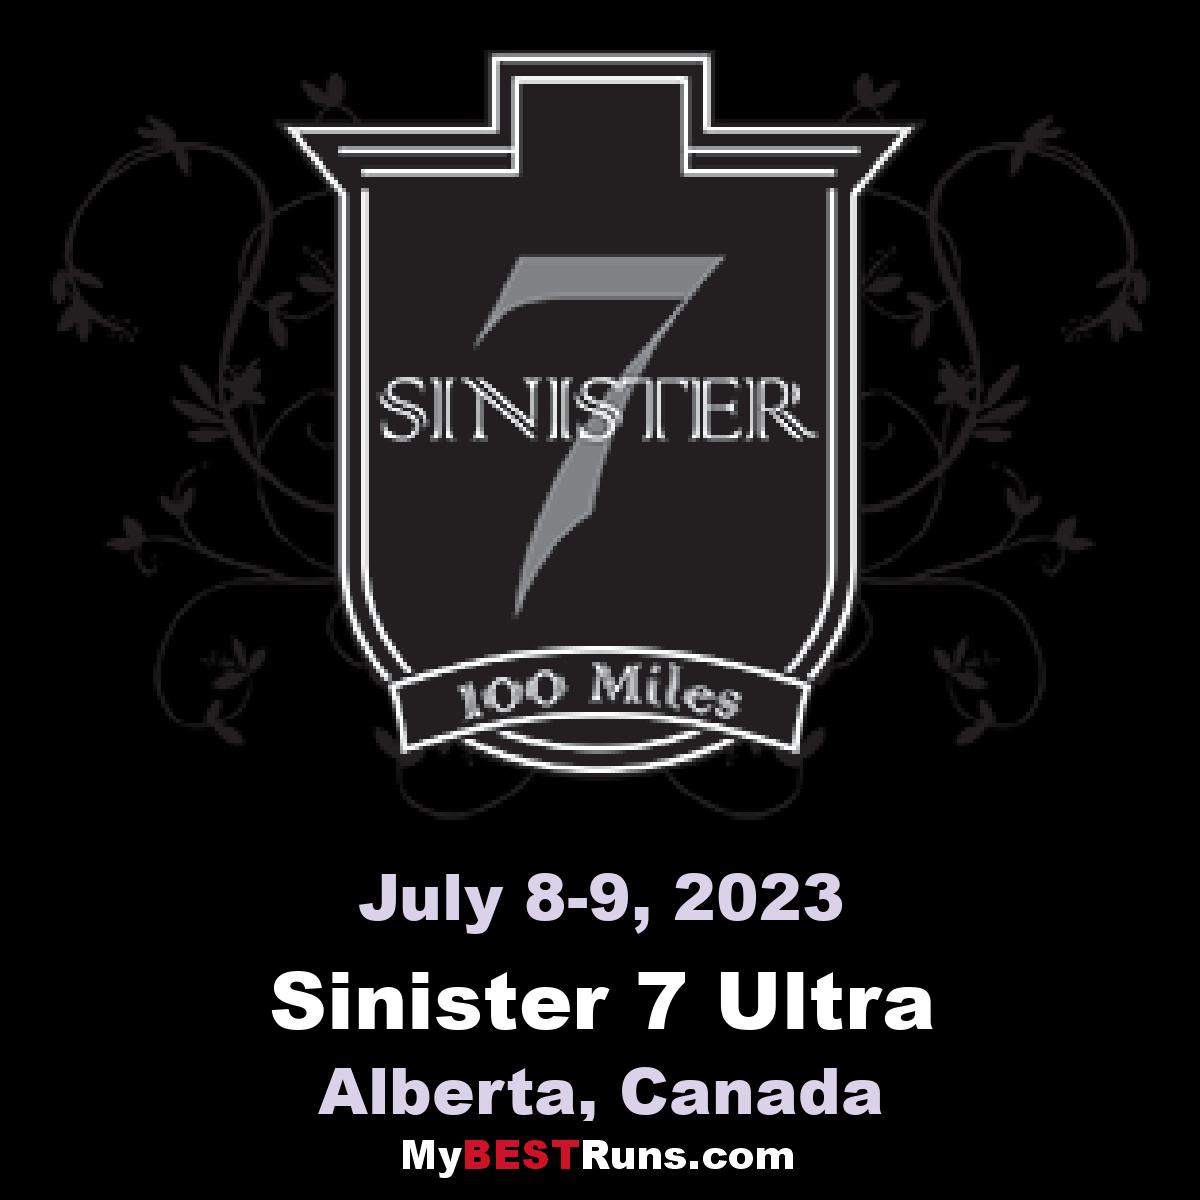 Sinister 7 Ultra